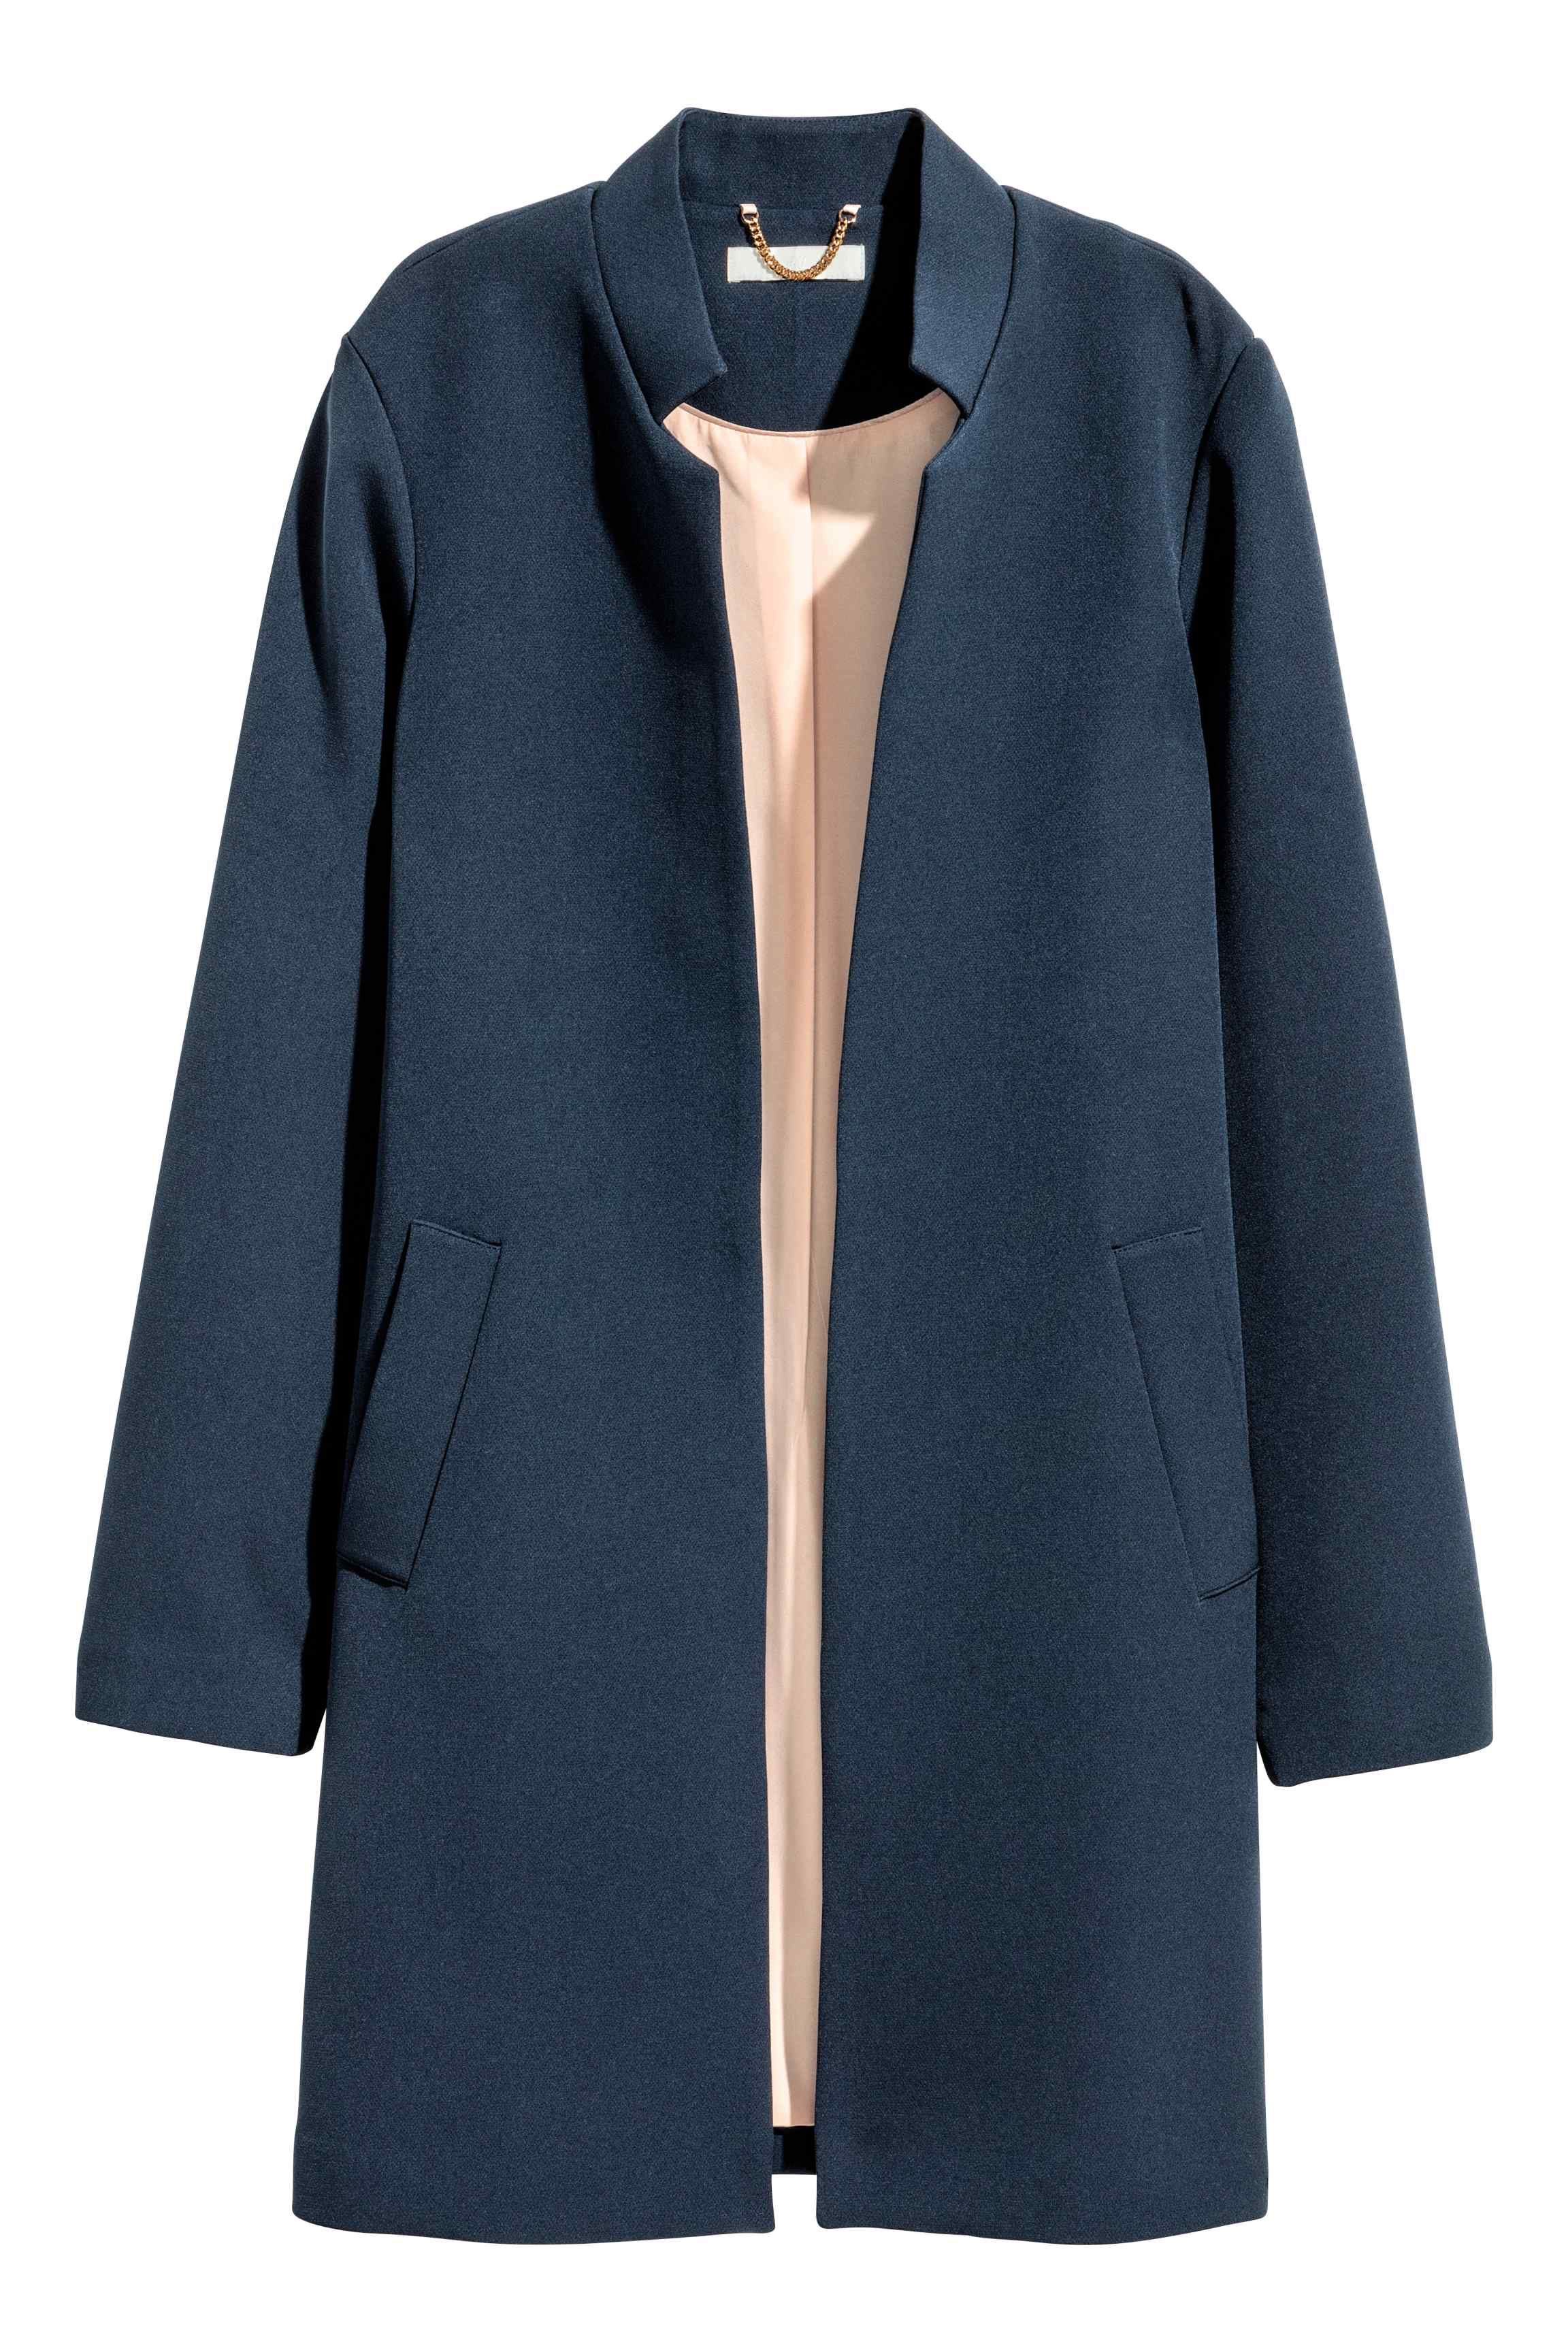 Abrigo corto - Azul oscuro - MUJER  5022e46985a2